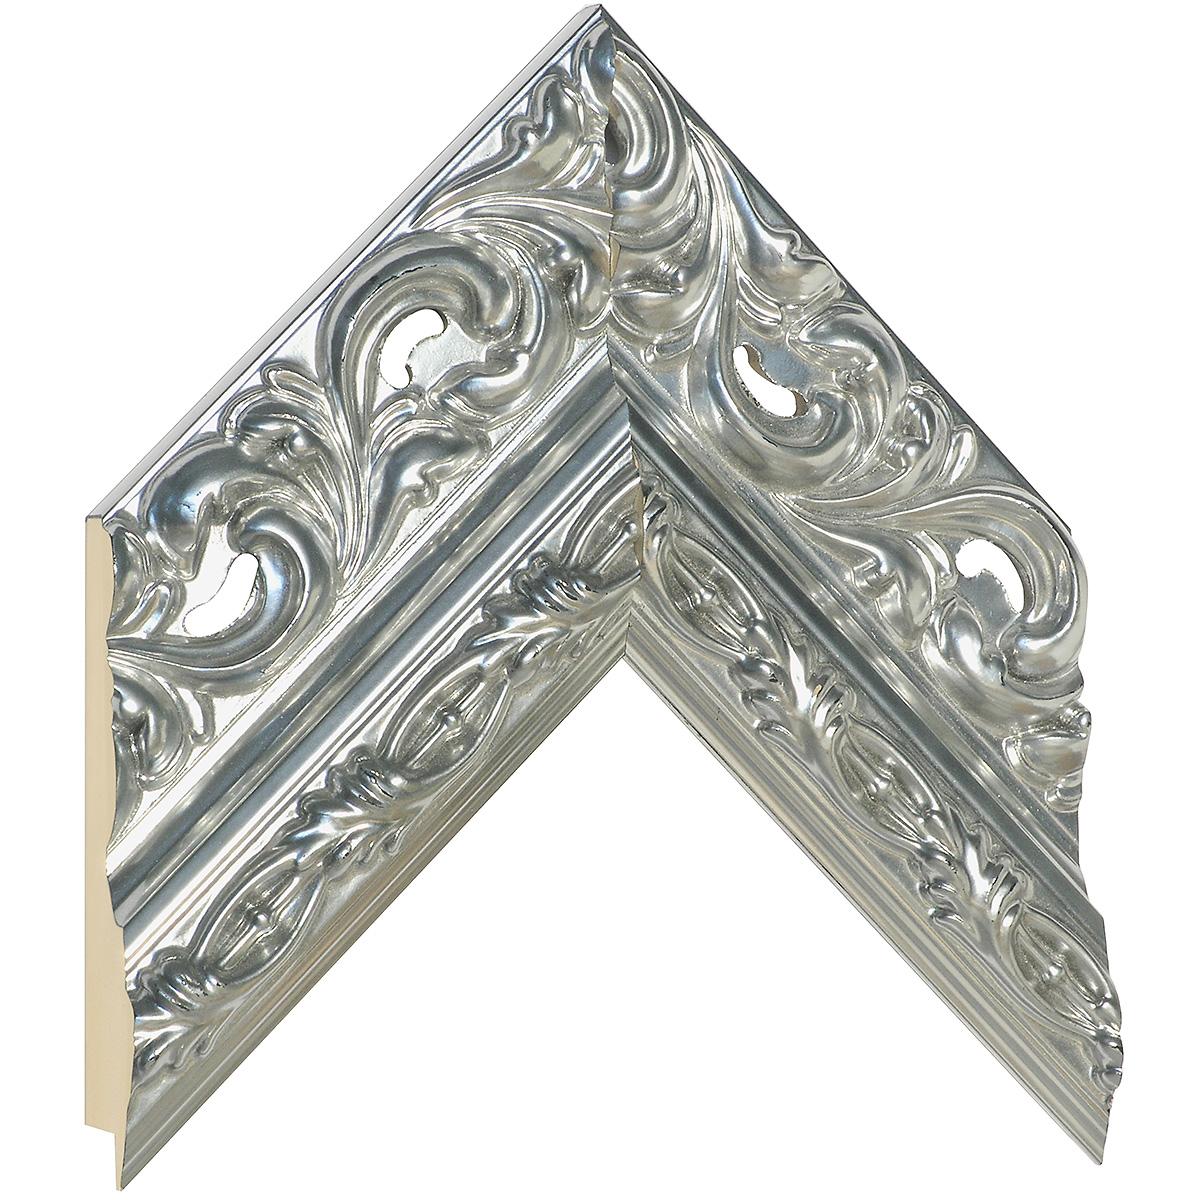 Moulding finger-joint pine Width 95mm - Silver